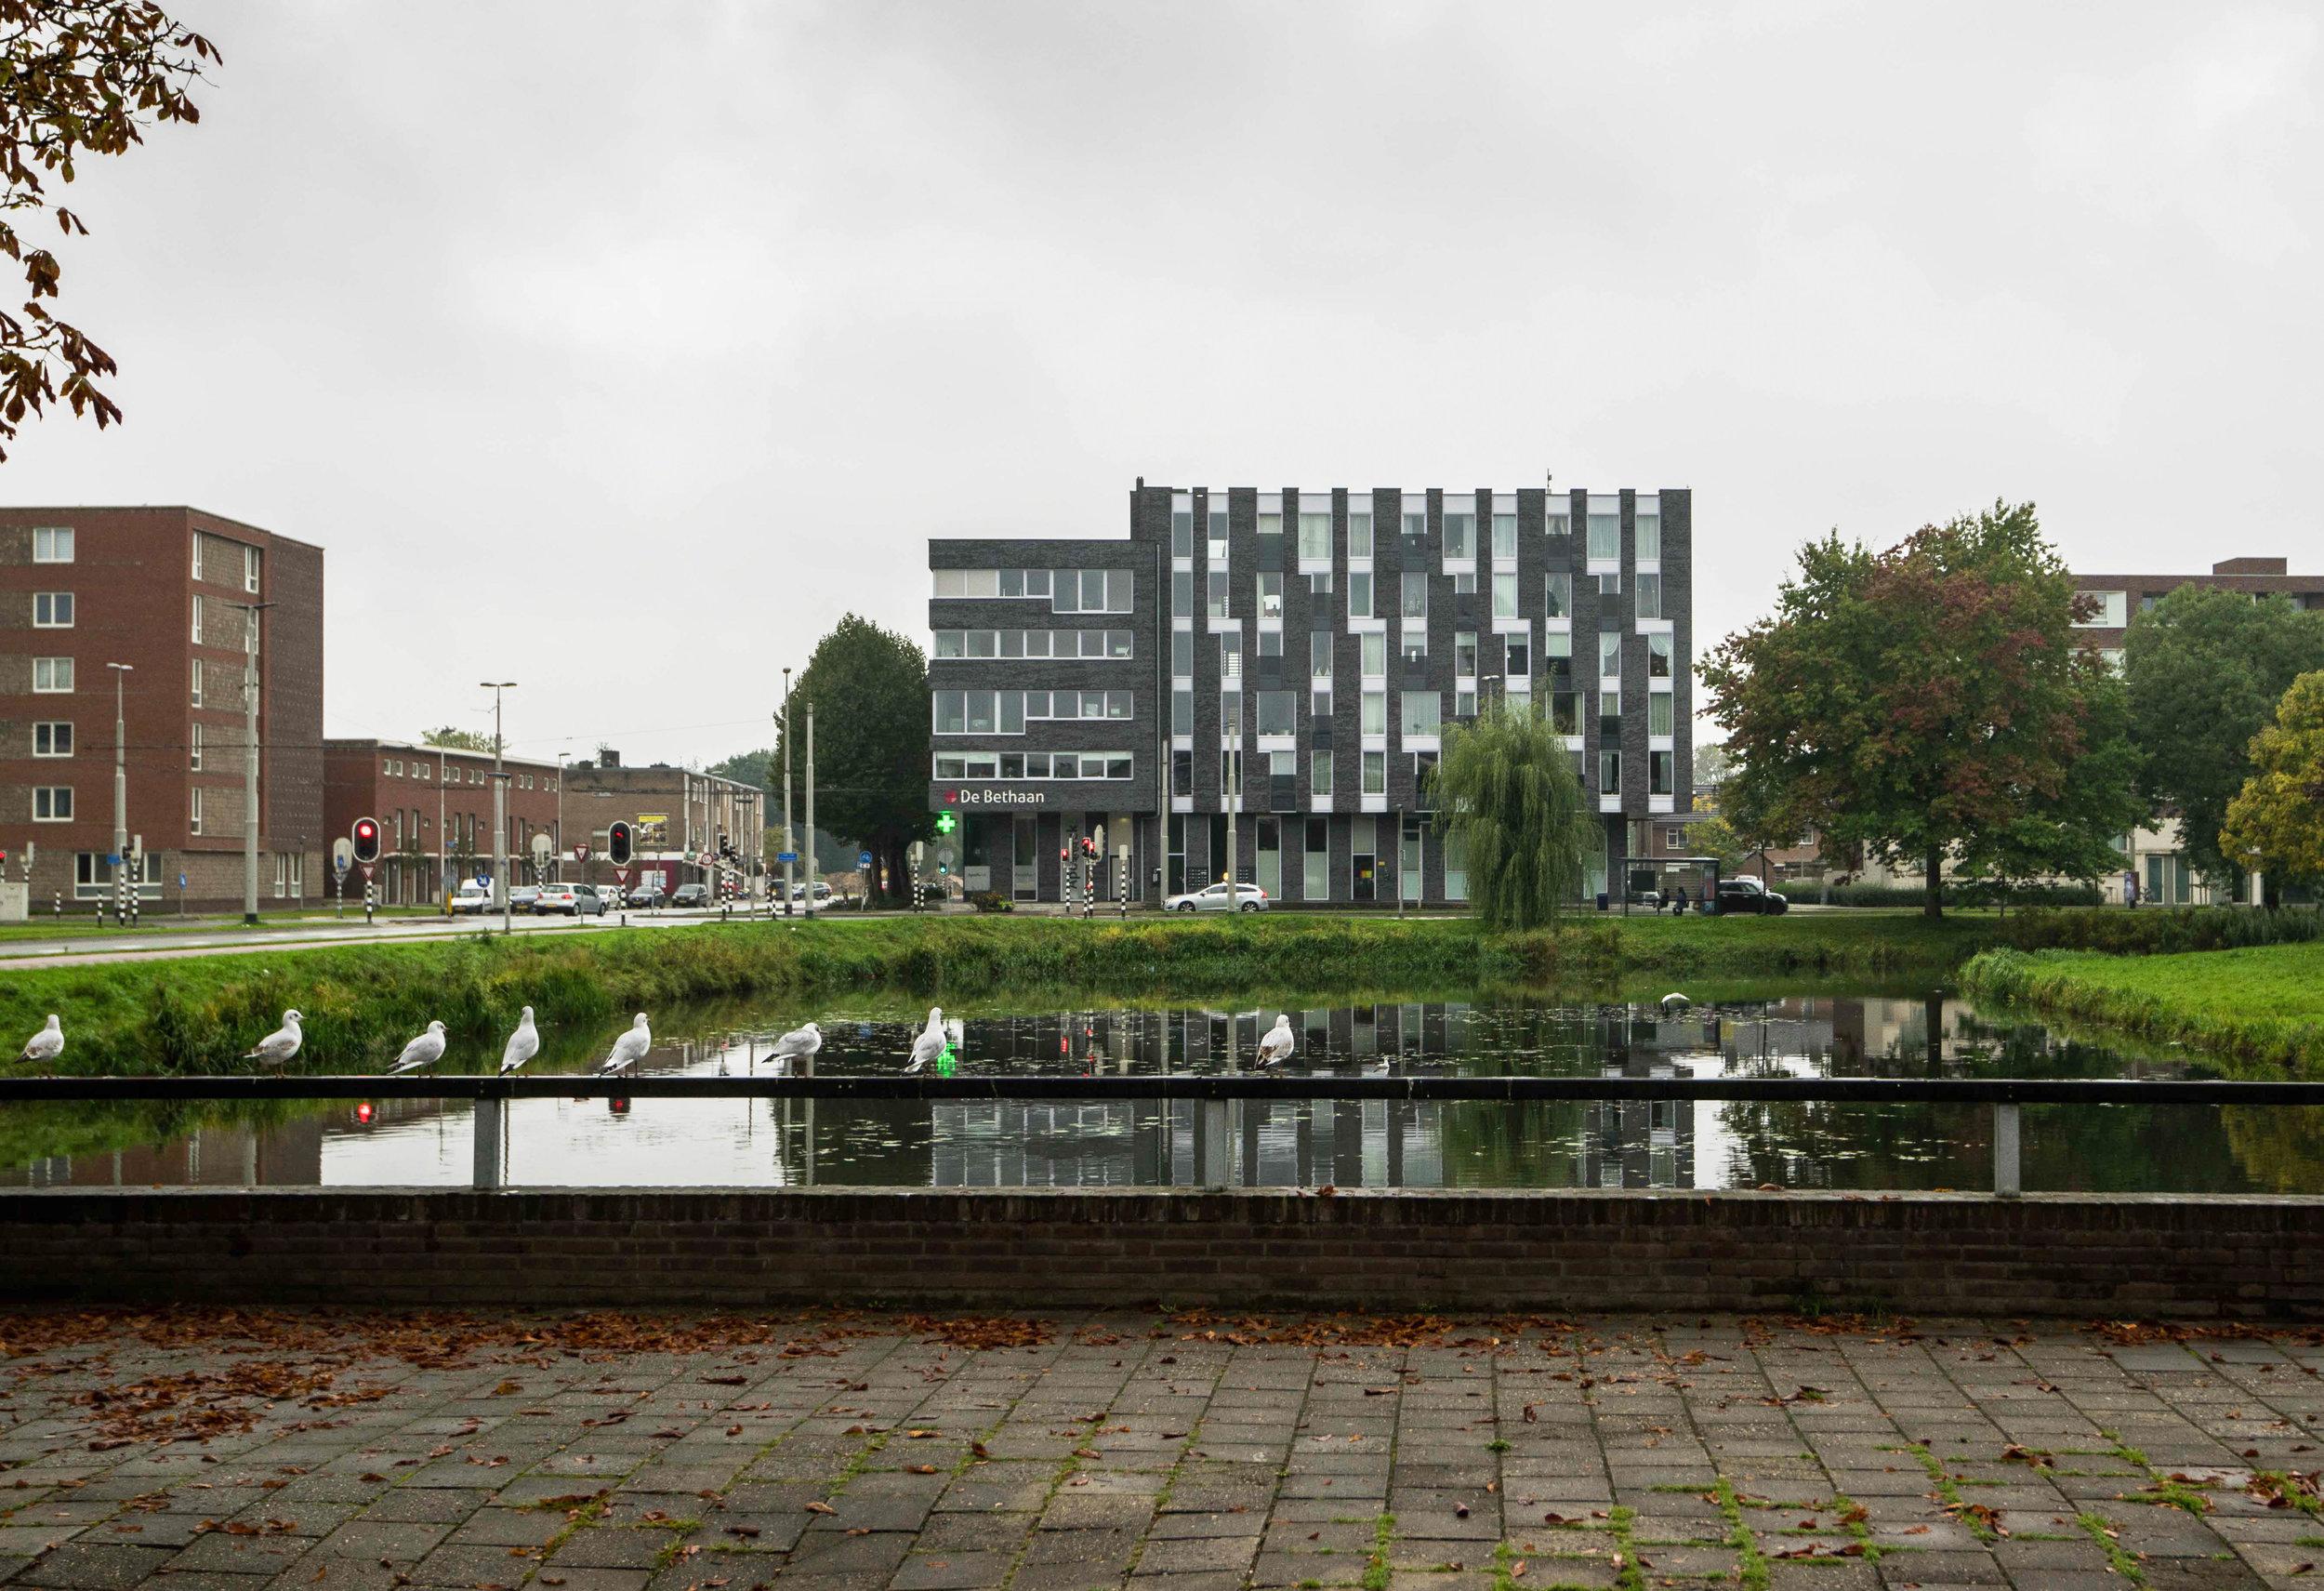 Nederland 10-01-2017 Dev LR-12.jpg